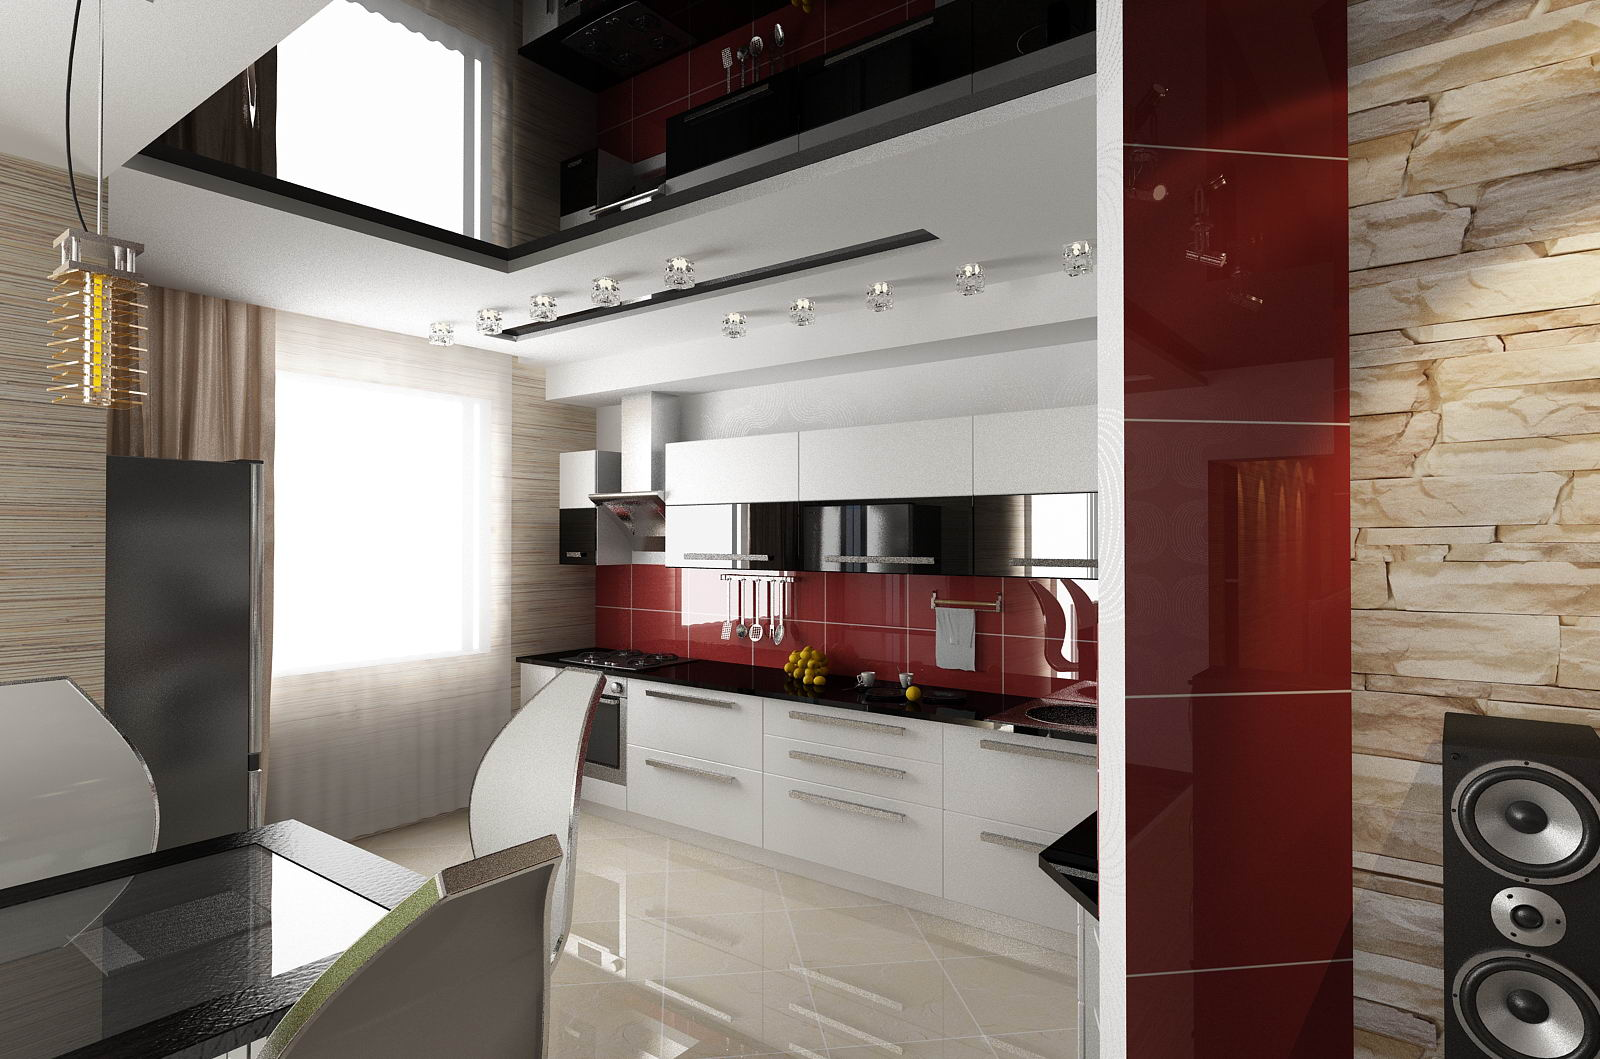 кухня фото интерьер в квартире